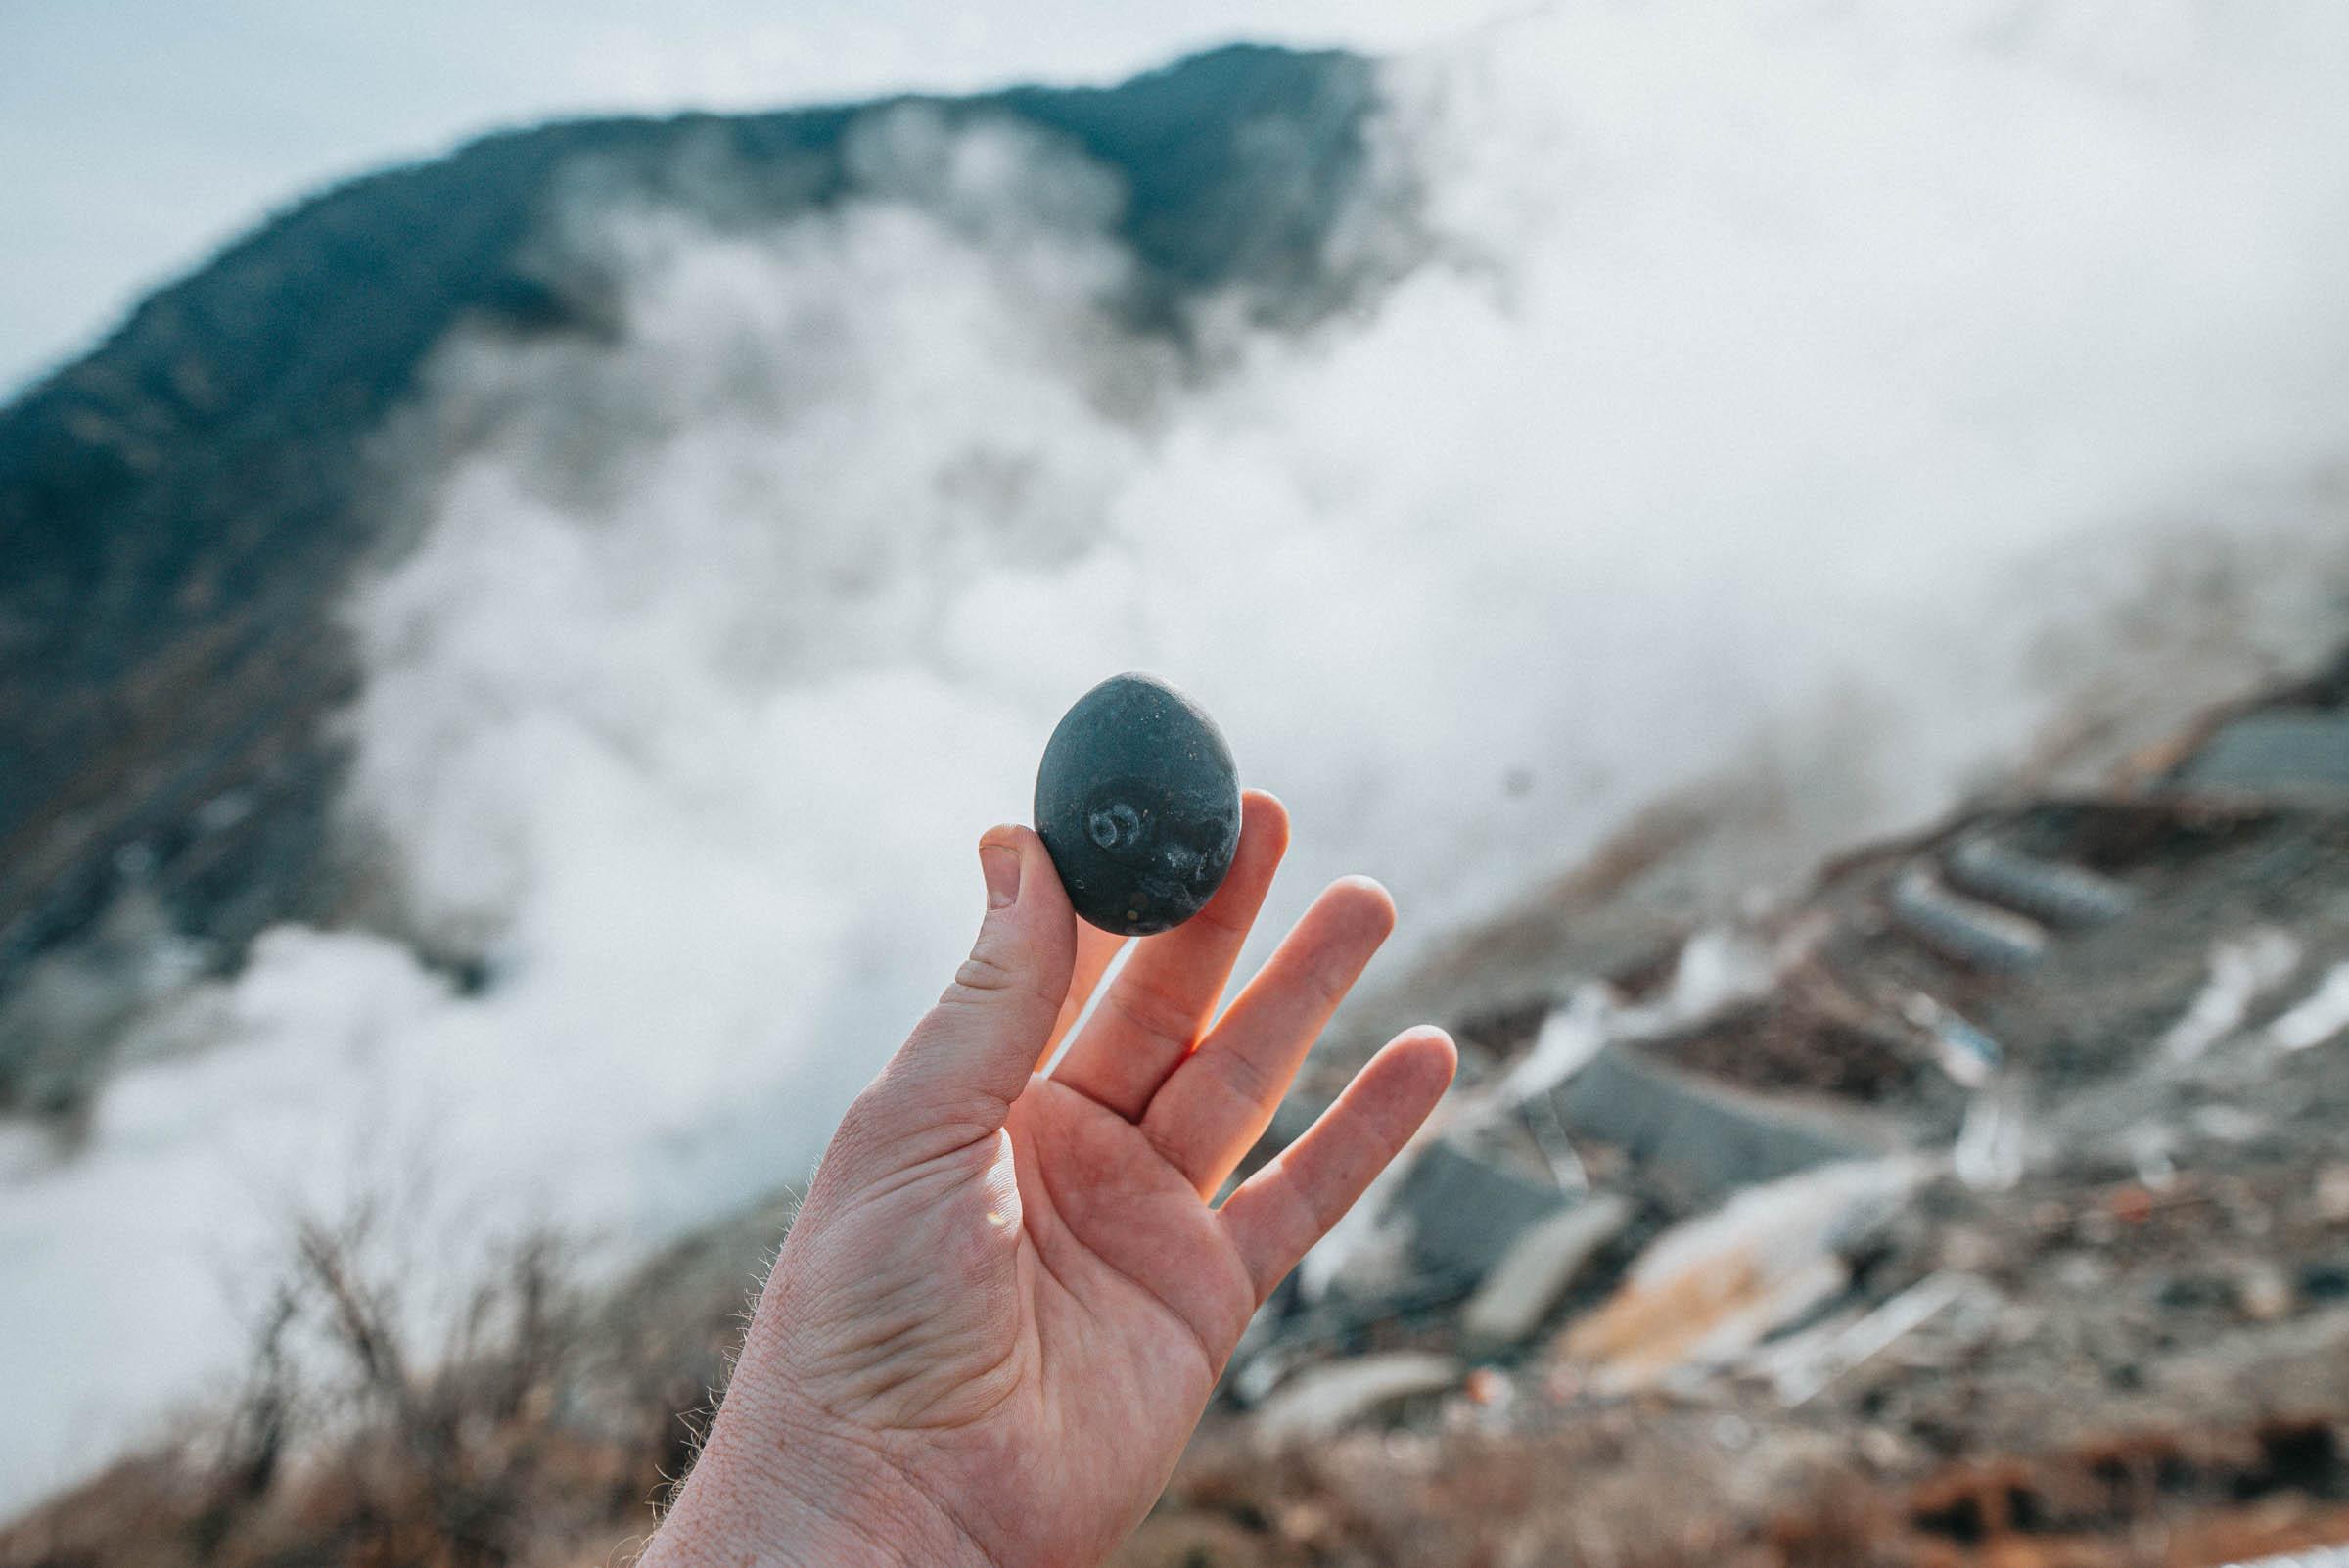 Black Egg, Owakudani Valley, Hakone, Japan